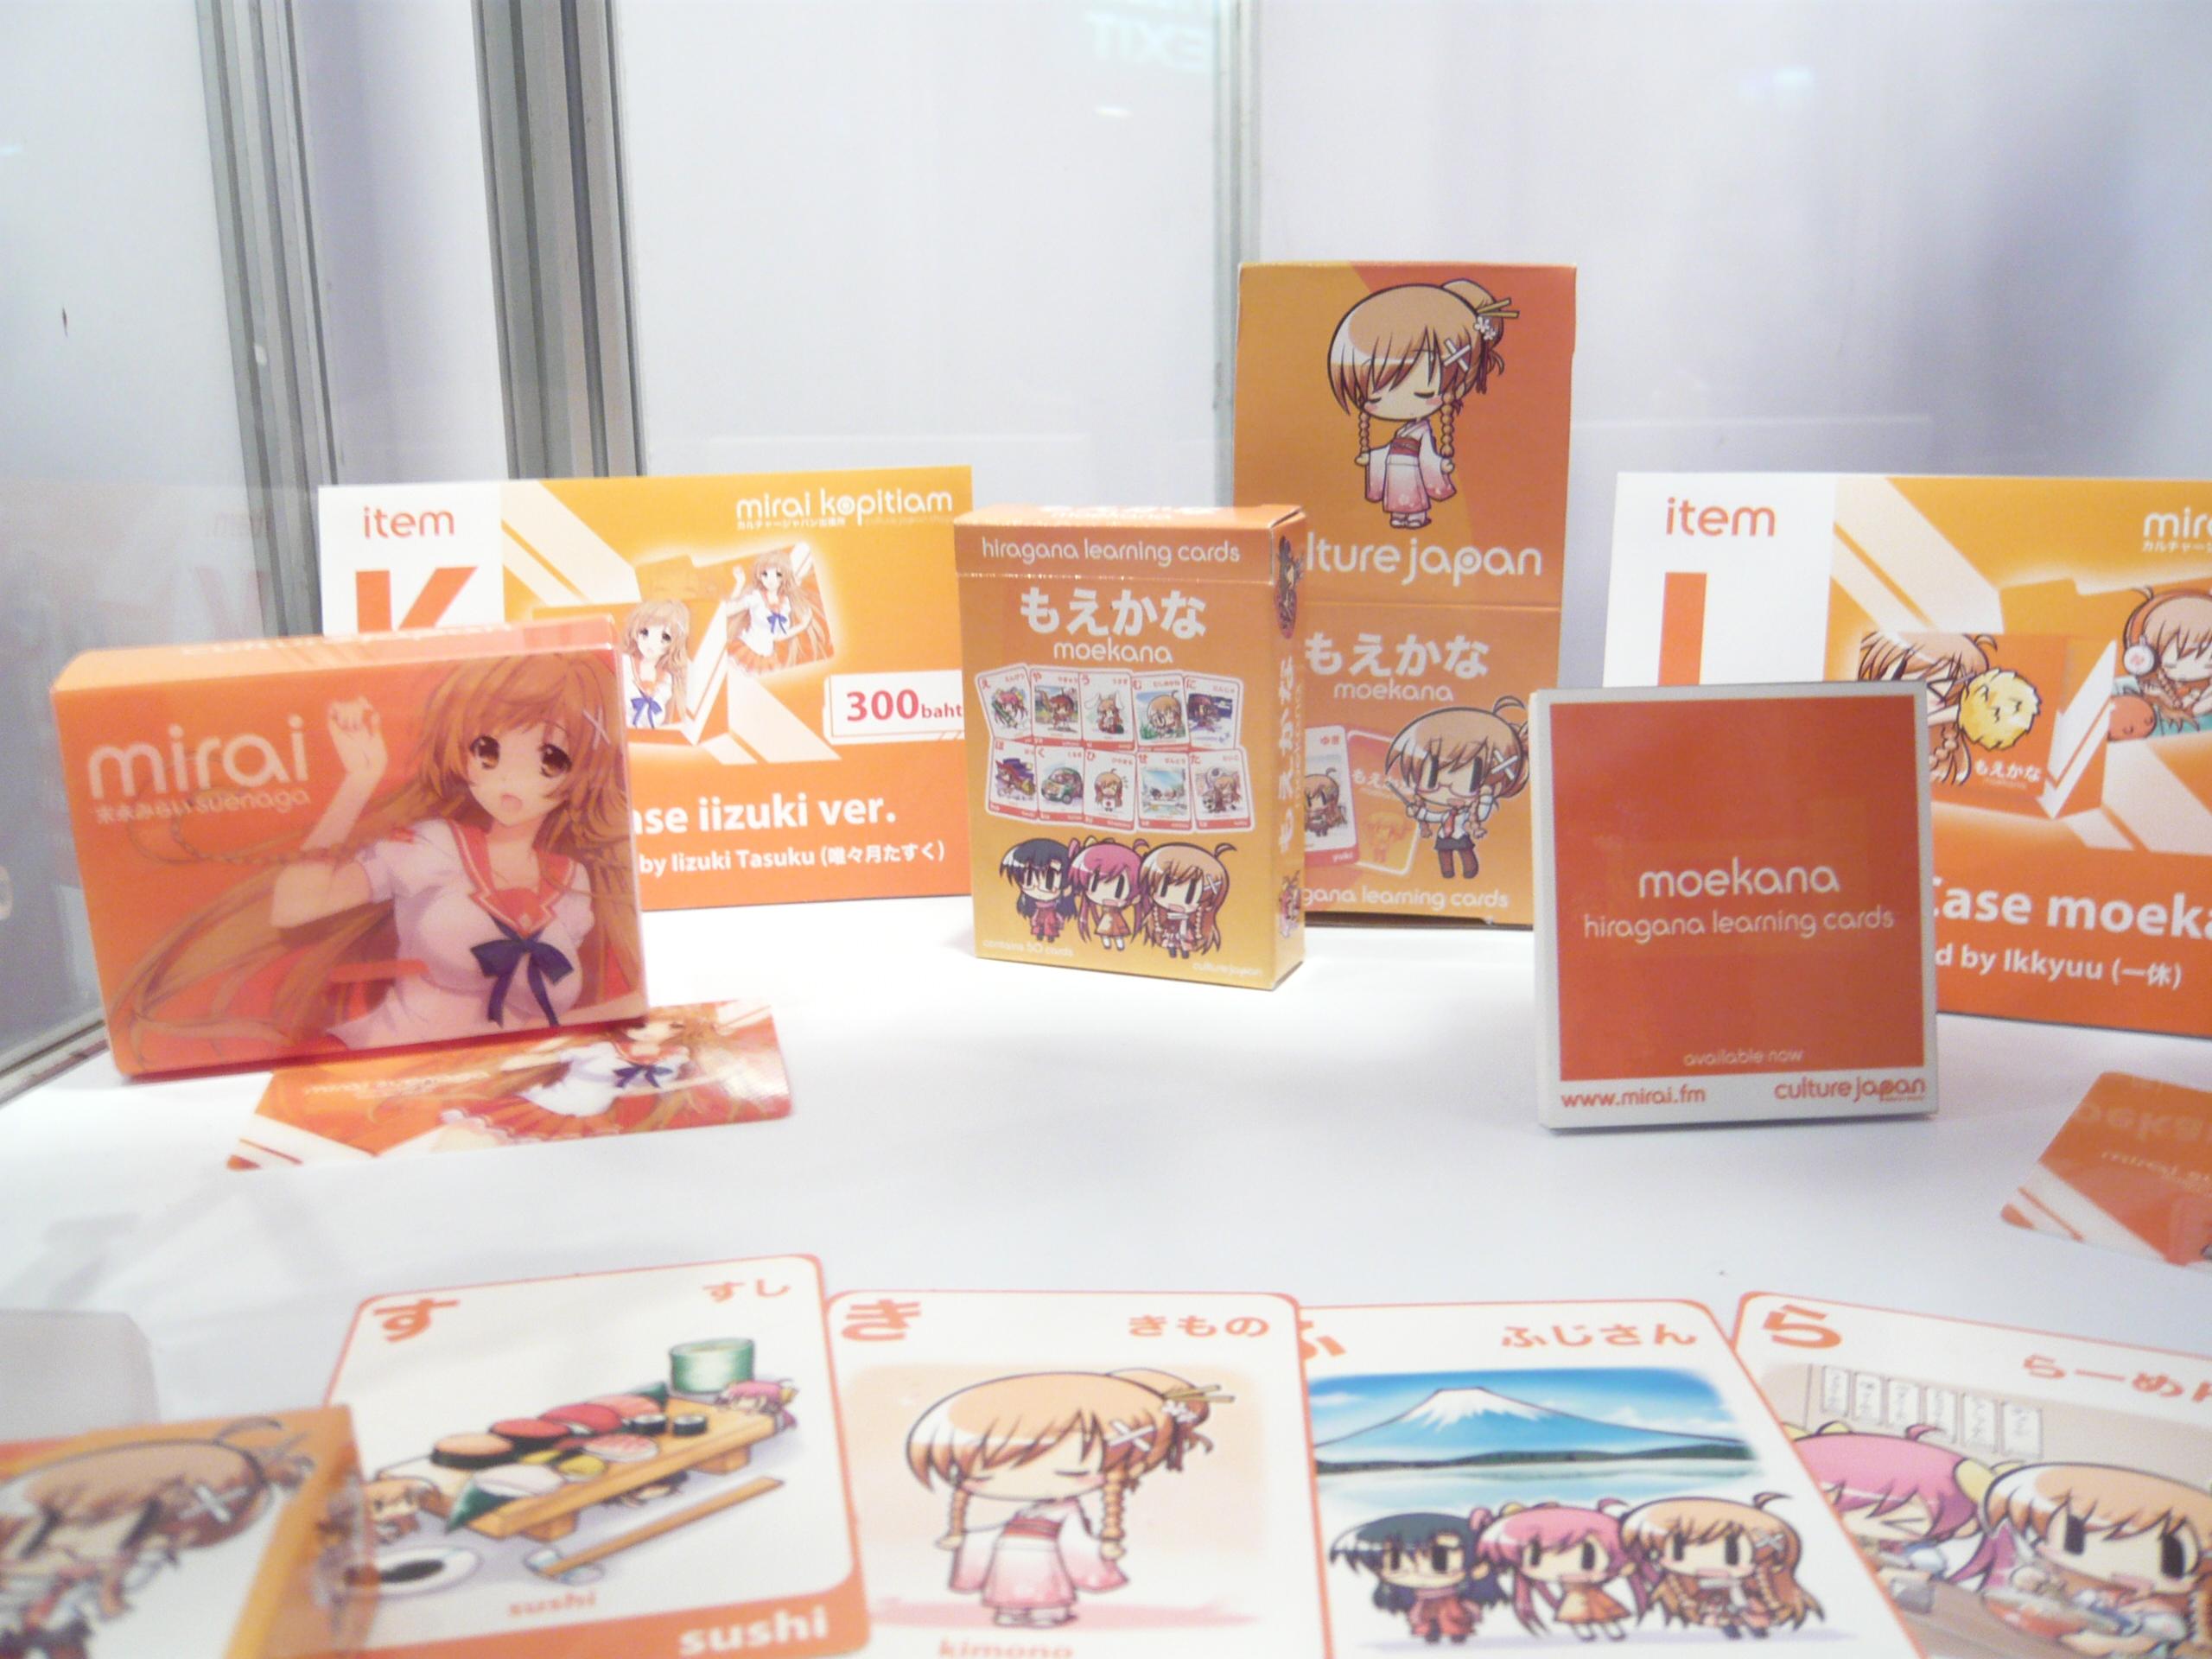 good_smile_company culture_japan suenaga_mirai suenaga_haruka hoshikawa_kanata iizuki_tasuku mirai_millennium touch_'n_go_sdn_bhd touch_'n_go_card